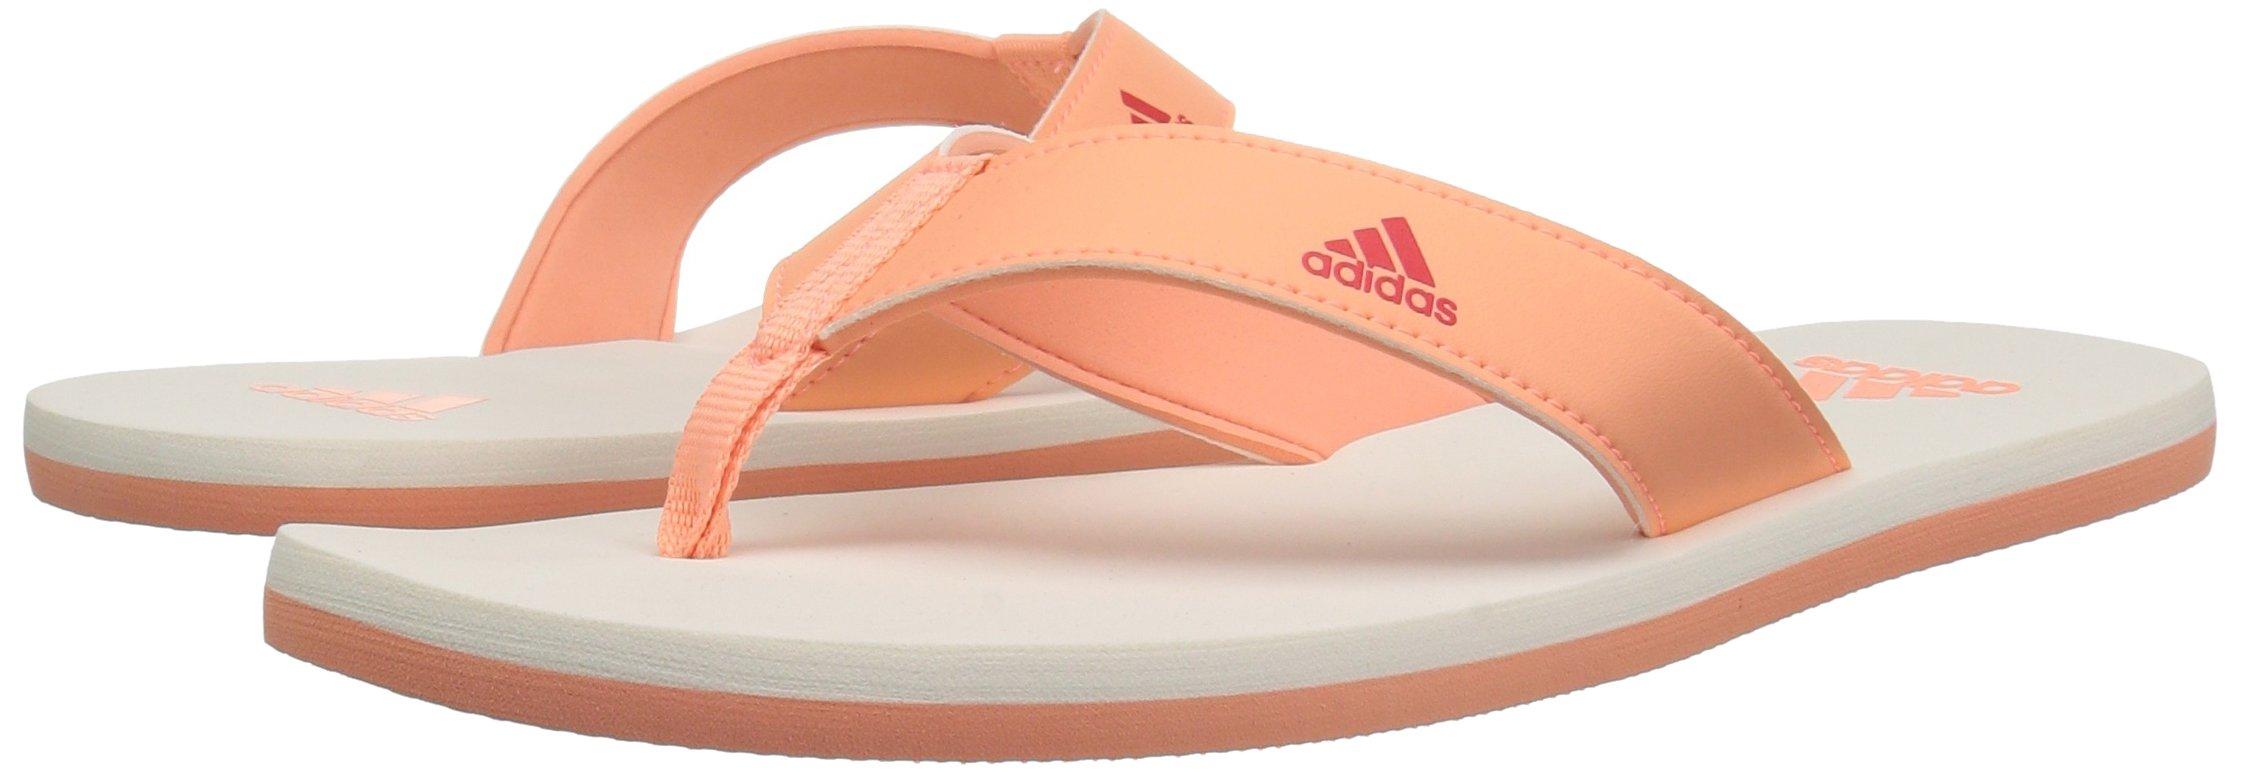 adidas Performance Unisex-Kids Beach Thong 2 K, White/Hi-Res Blue/White, 13 M US Little Kid by adidas (Image #6)